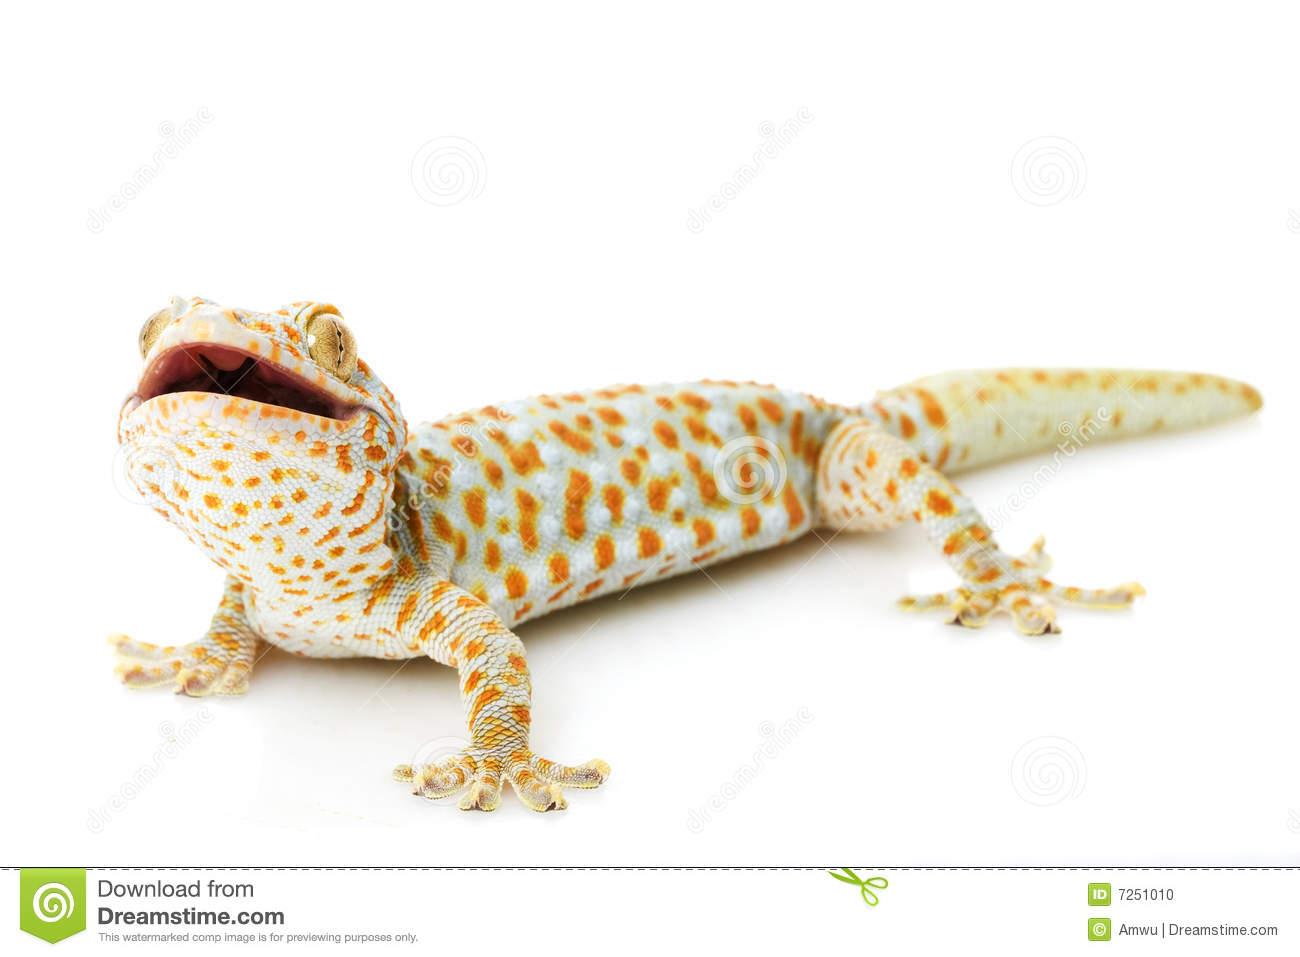 Tokay Gecko clipart #17, Download drawings